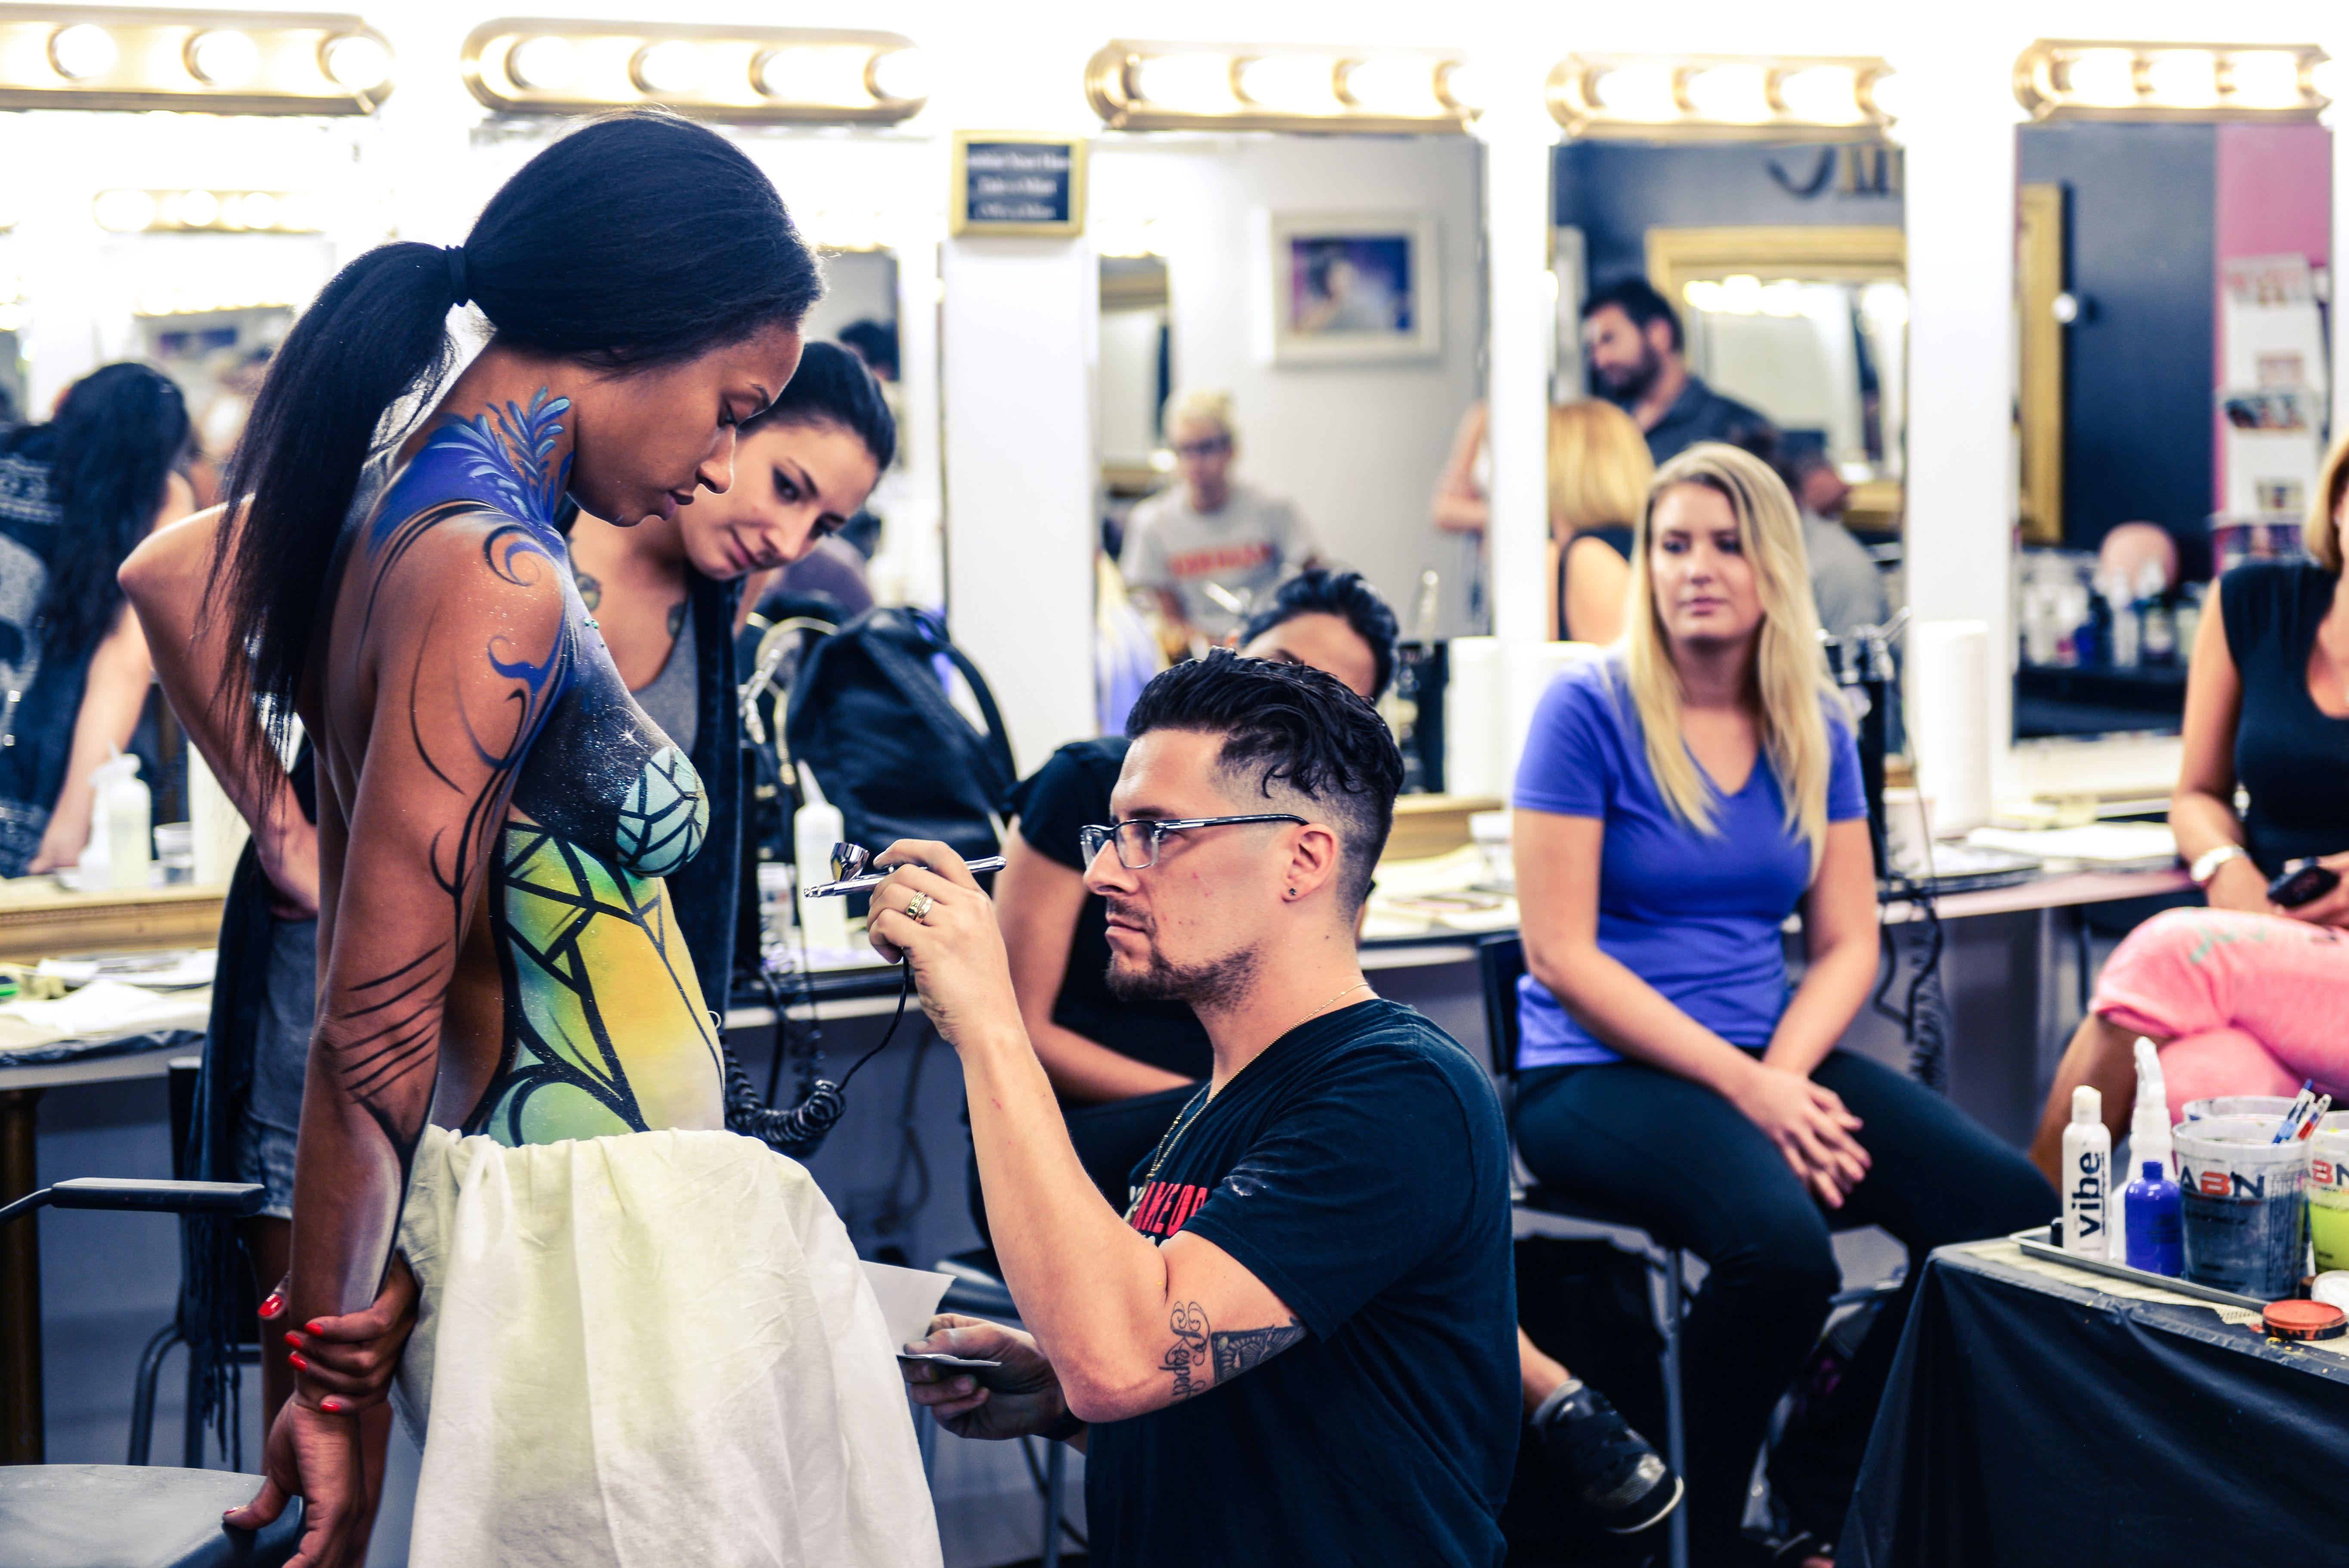 Airbrush Beauty And Bridal Makeup Classes At Cmc Makeup School Learn Airbrush Makeup Application And More At Cmc Makeup Scho School Makeup Makeup Class Makeup